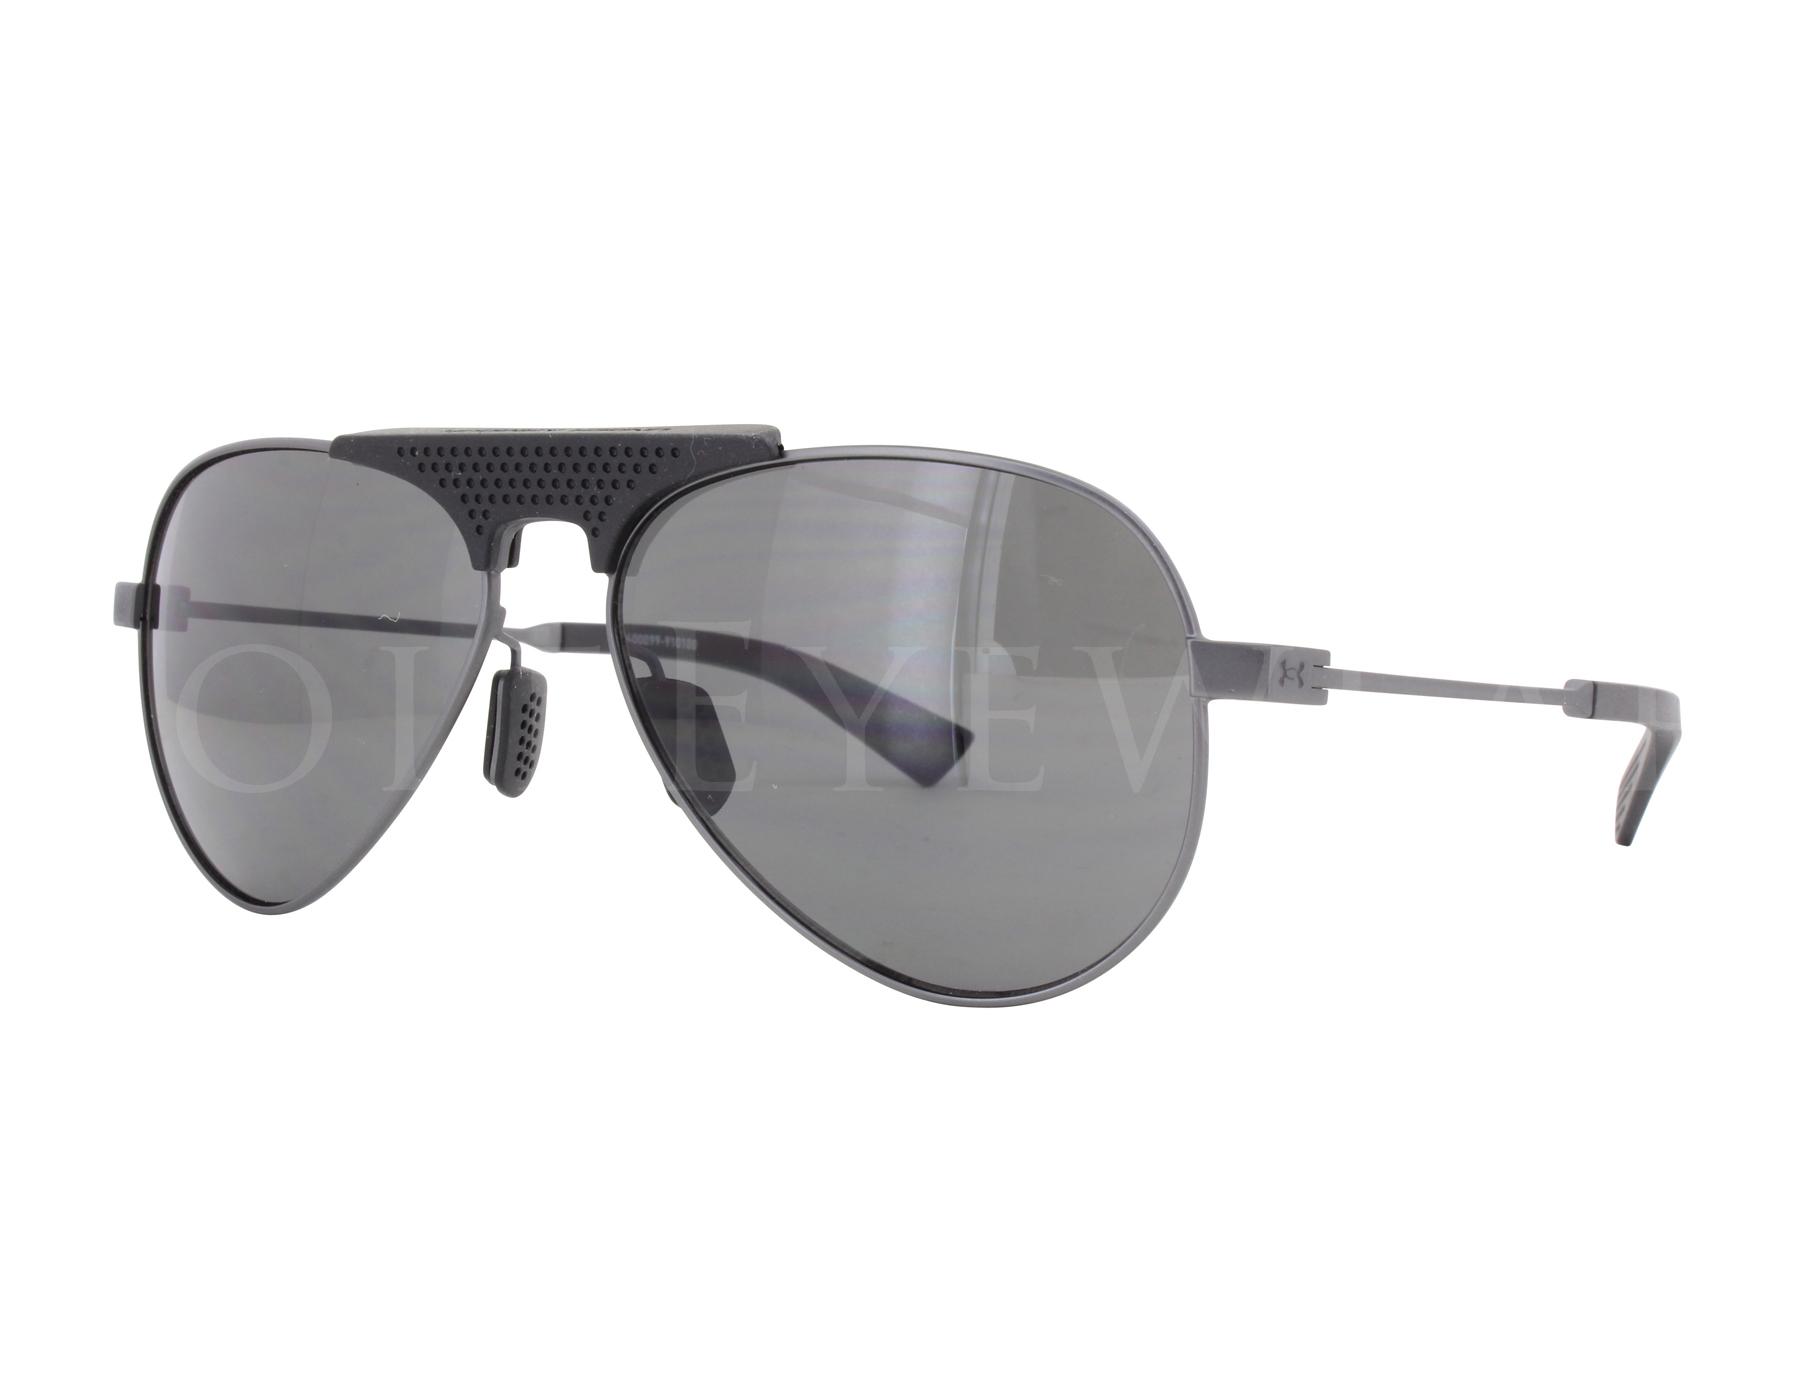 42753dbd2e NEW Under Armour Getaway Satin Gunmetal Black Grey Sunglasses ...